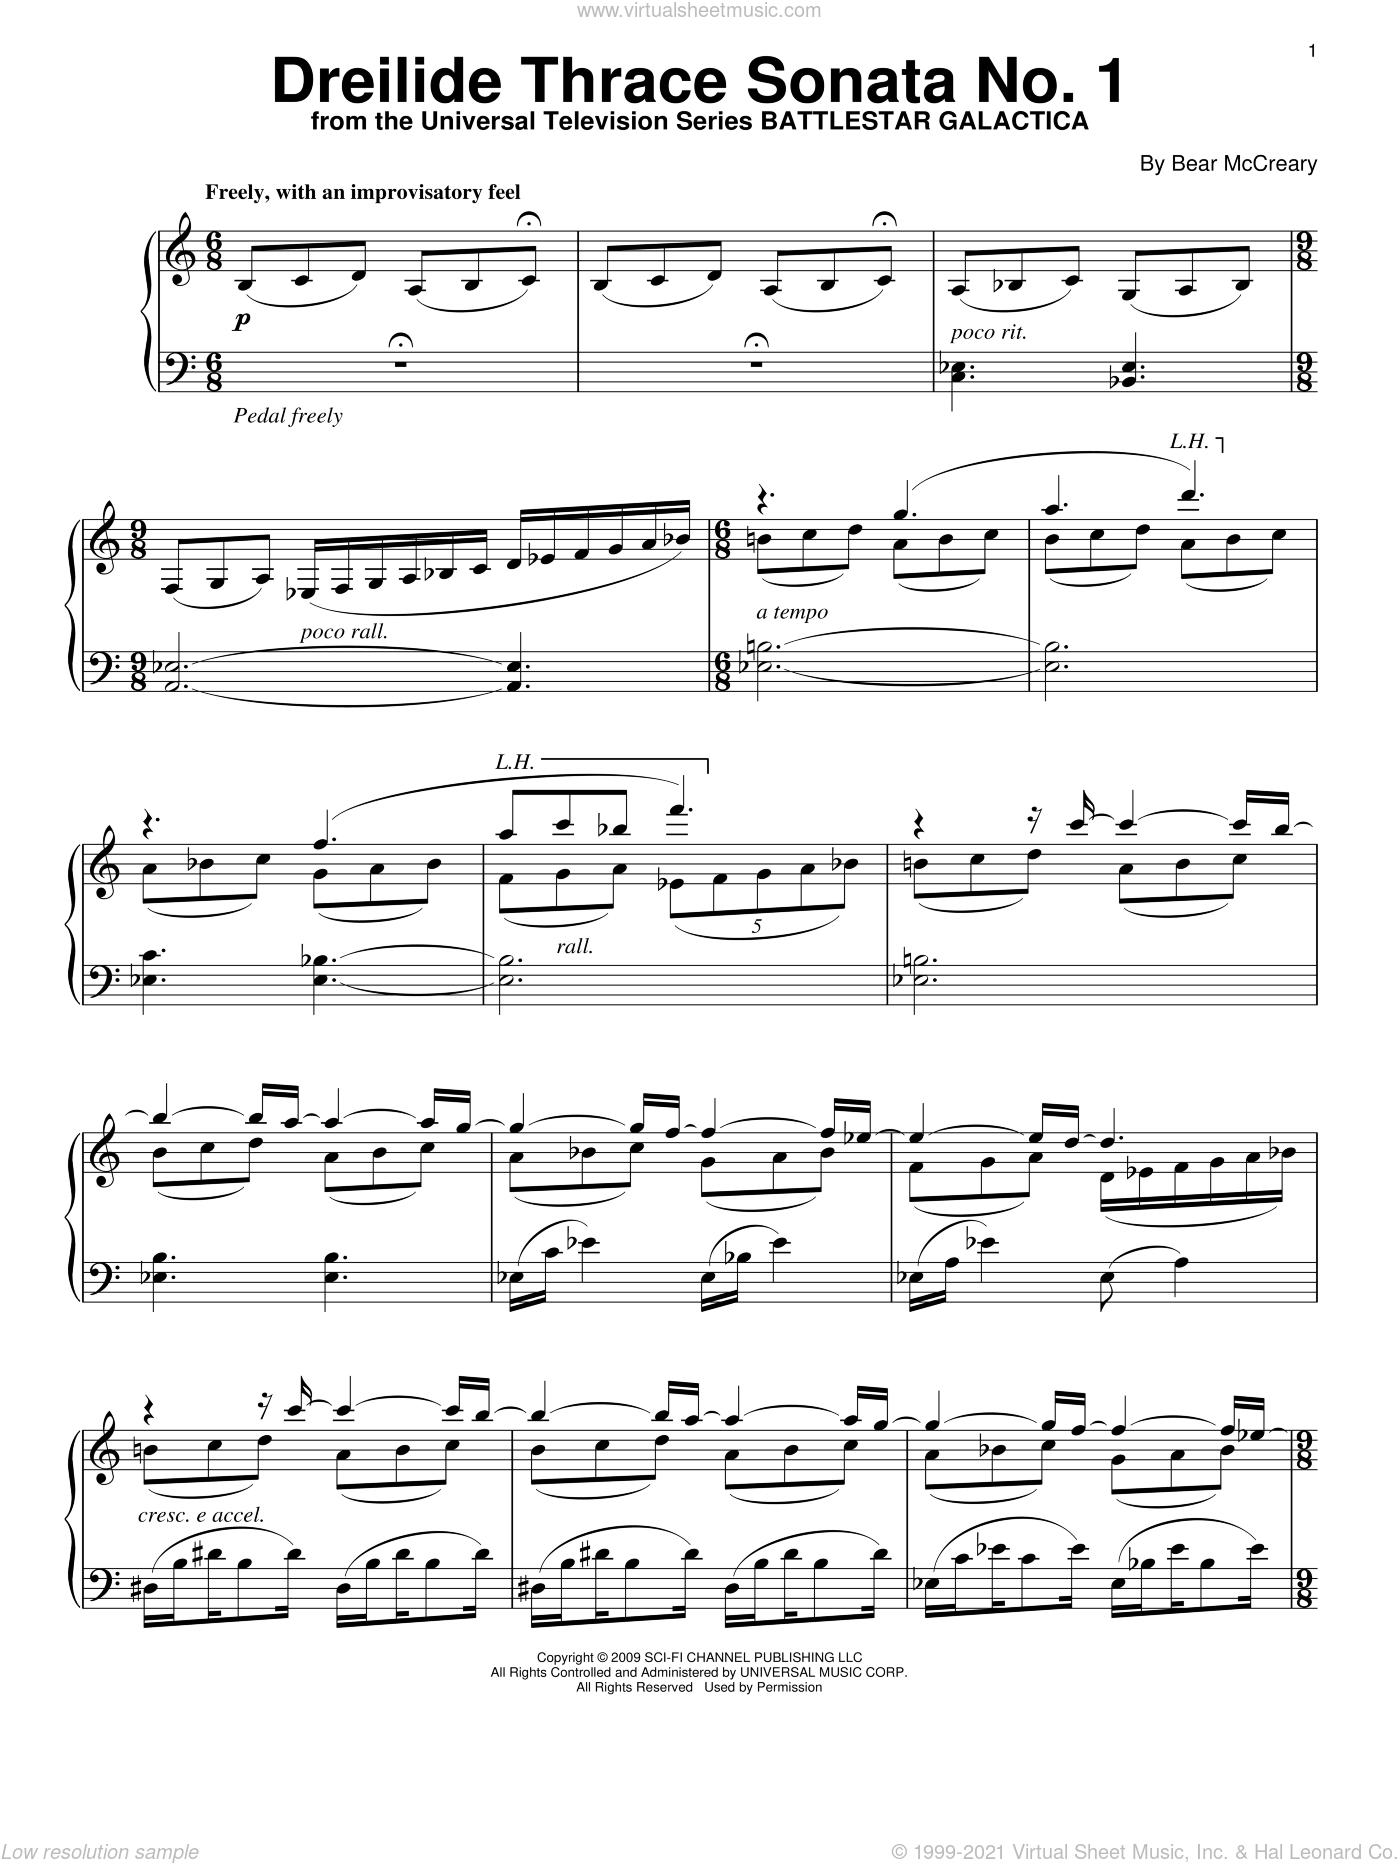 Dreilide Thrace Sonata No. 1 sheet music for piano solo by Bear McCreary and Battlestar Galactica (TV Series), intermediate skill level